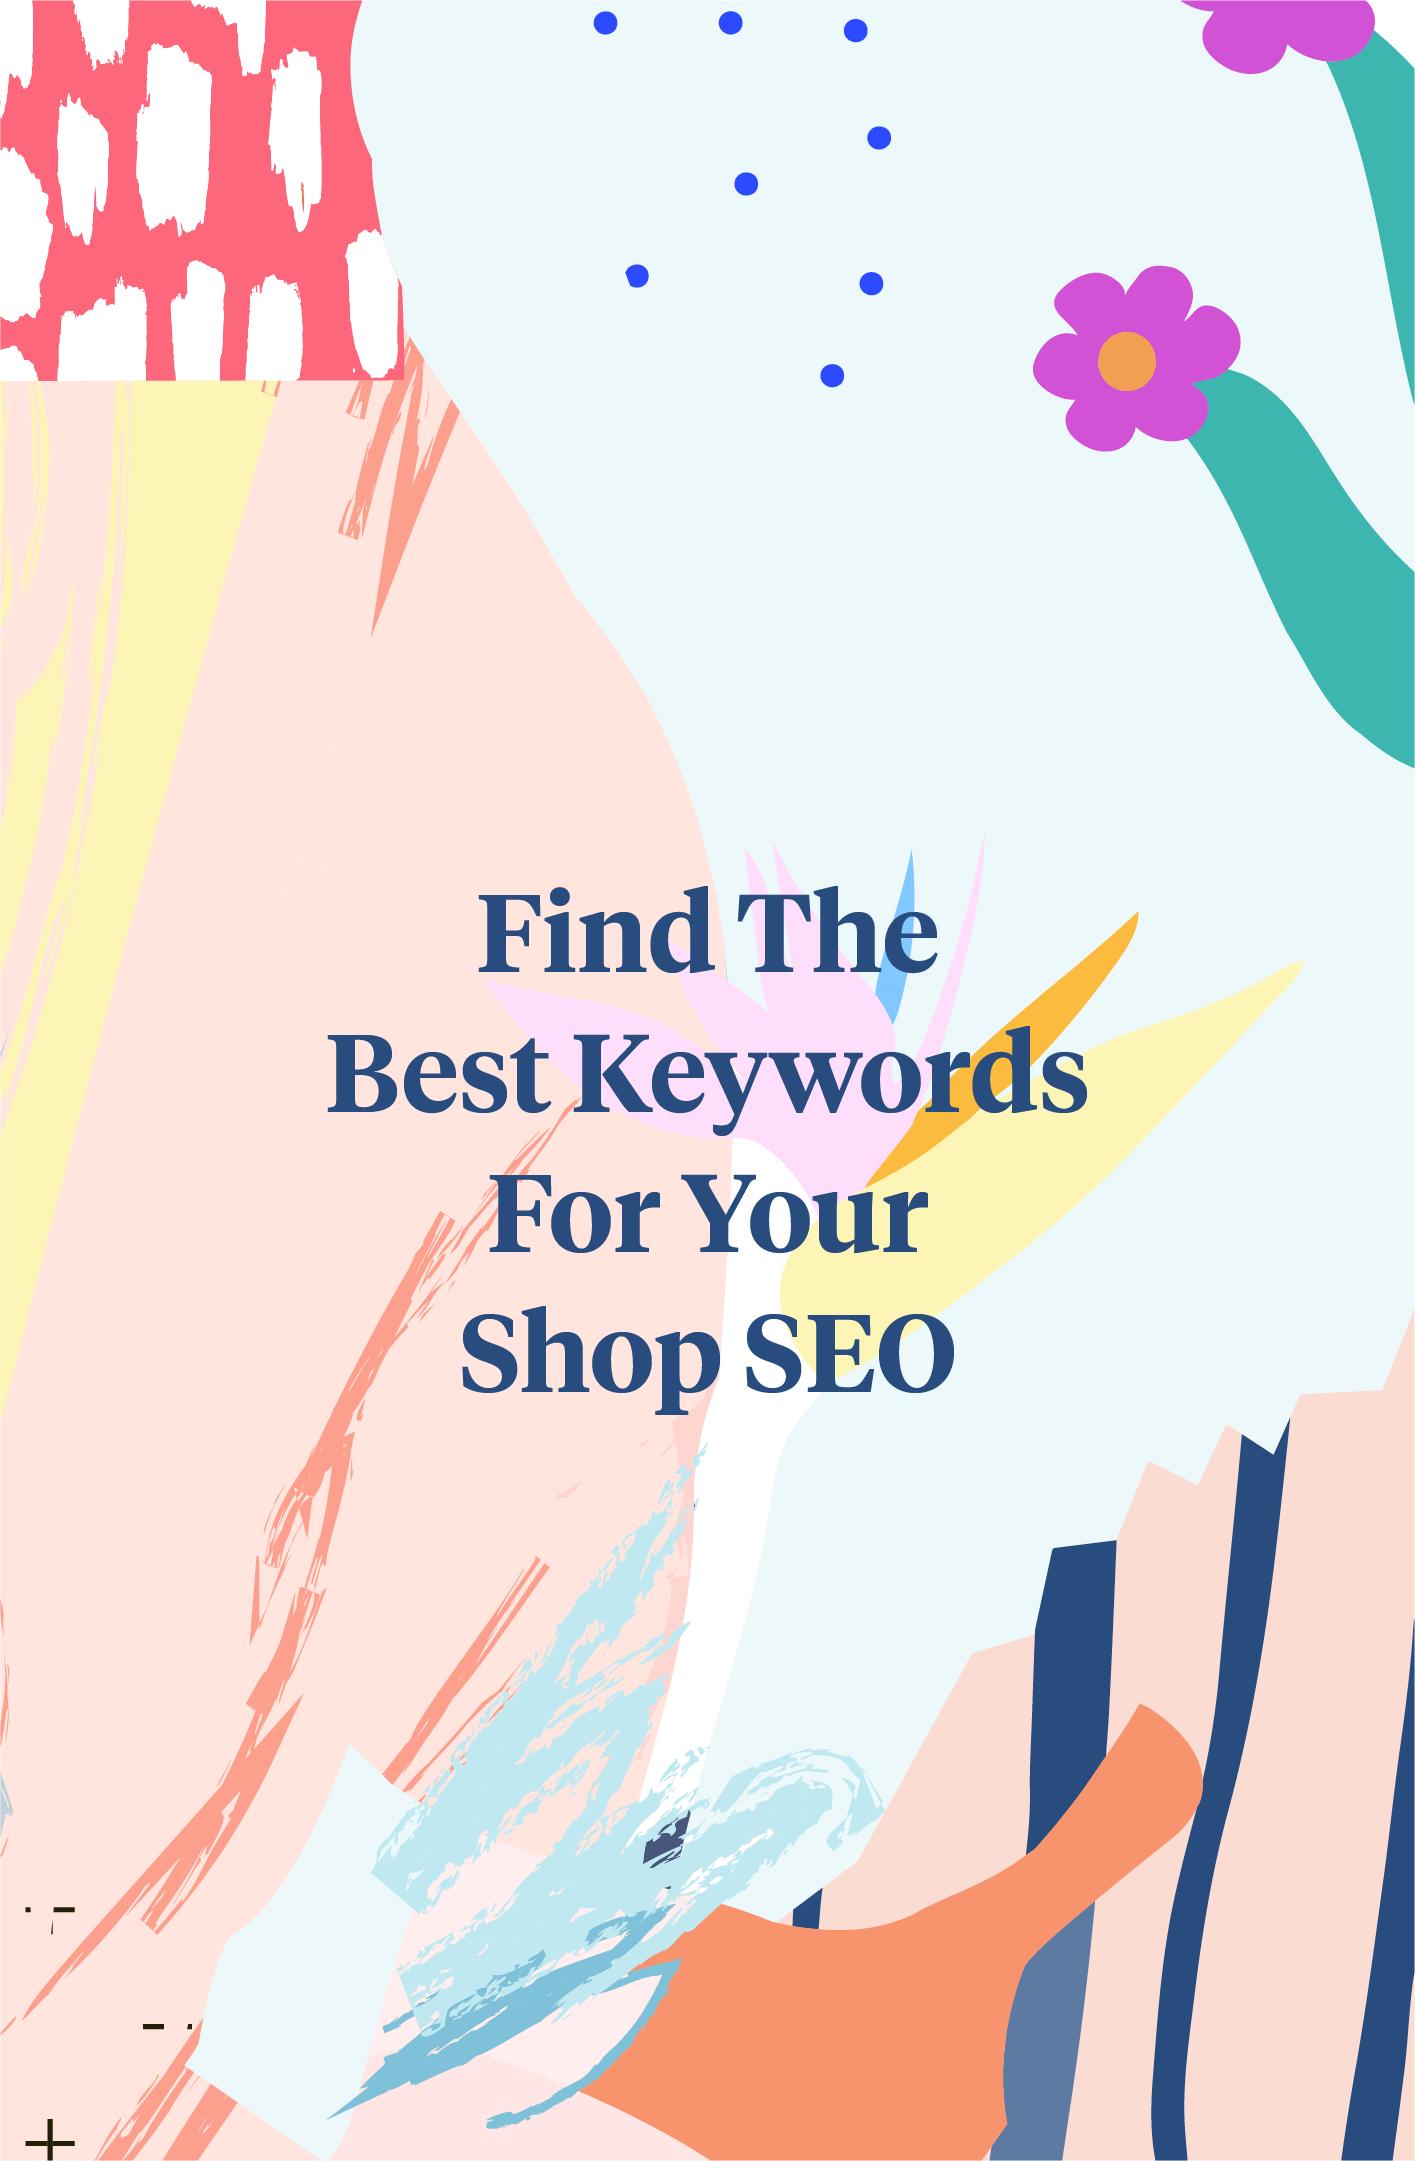 Seo Keyword Research Worksheet Free Printable Seo Keywords Seo Worksheets Free